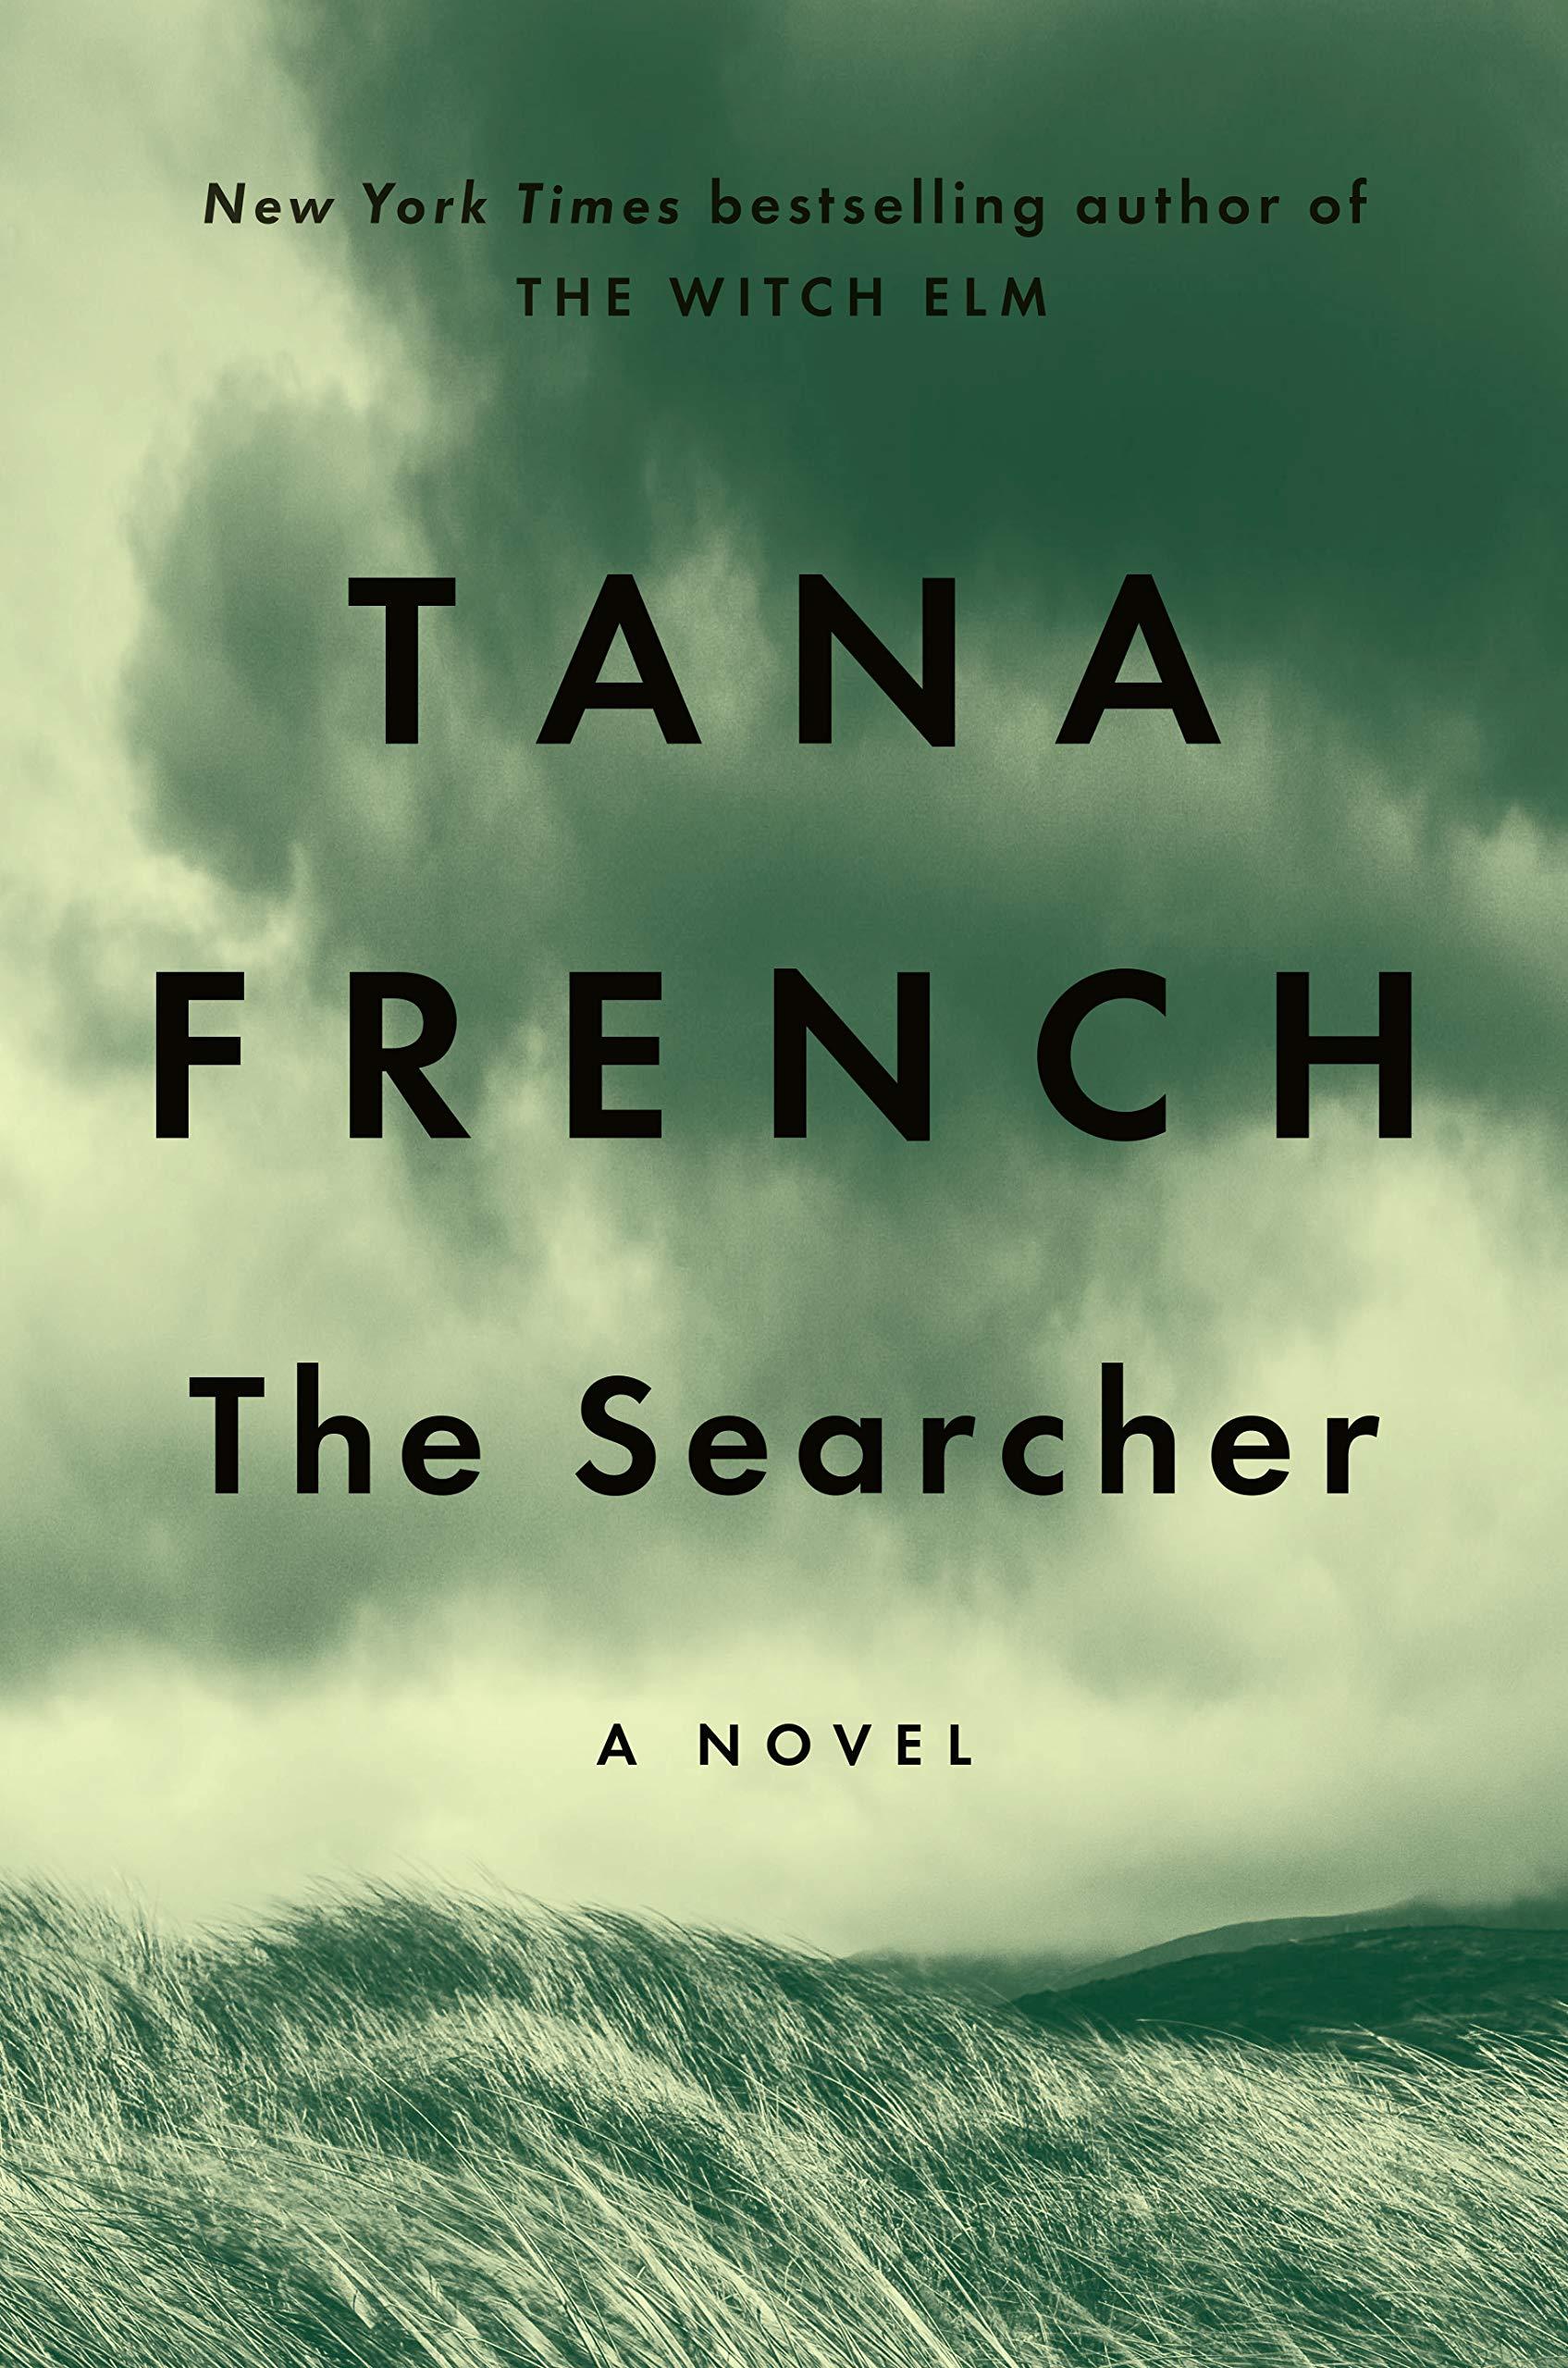 Searcher, The : French, Tana: Amazon.ca: Books